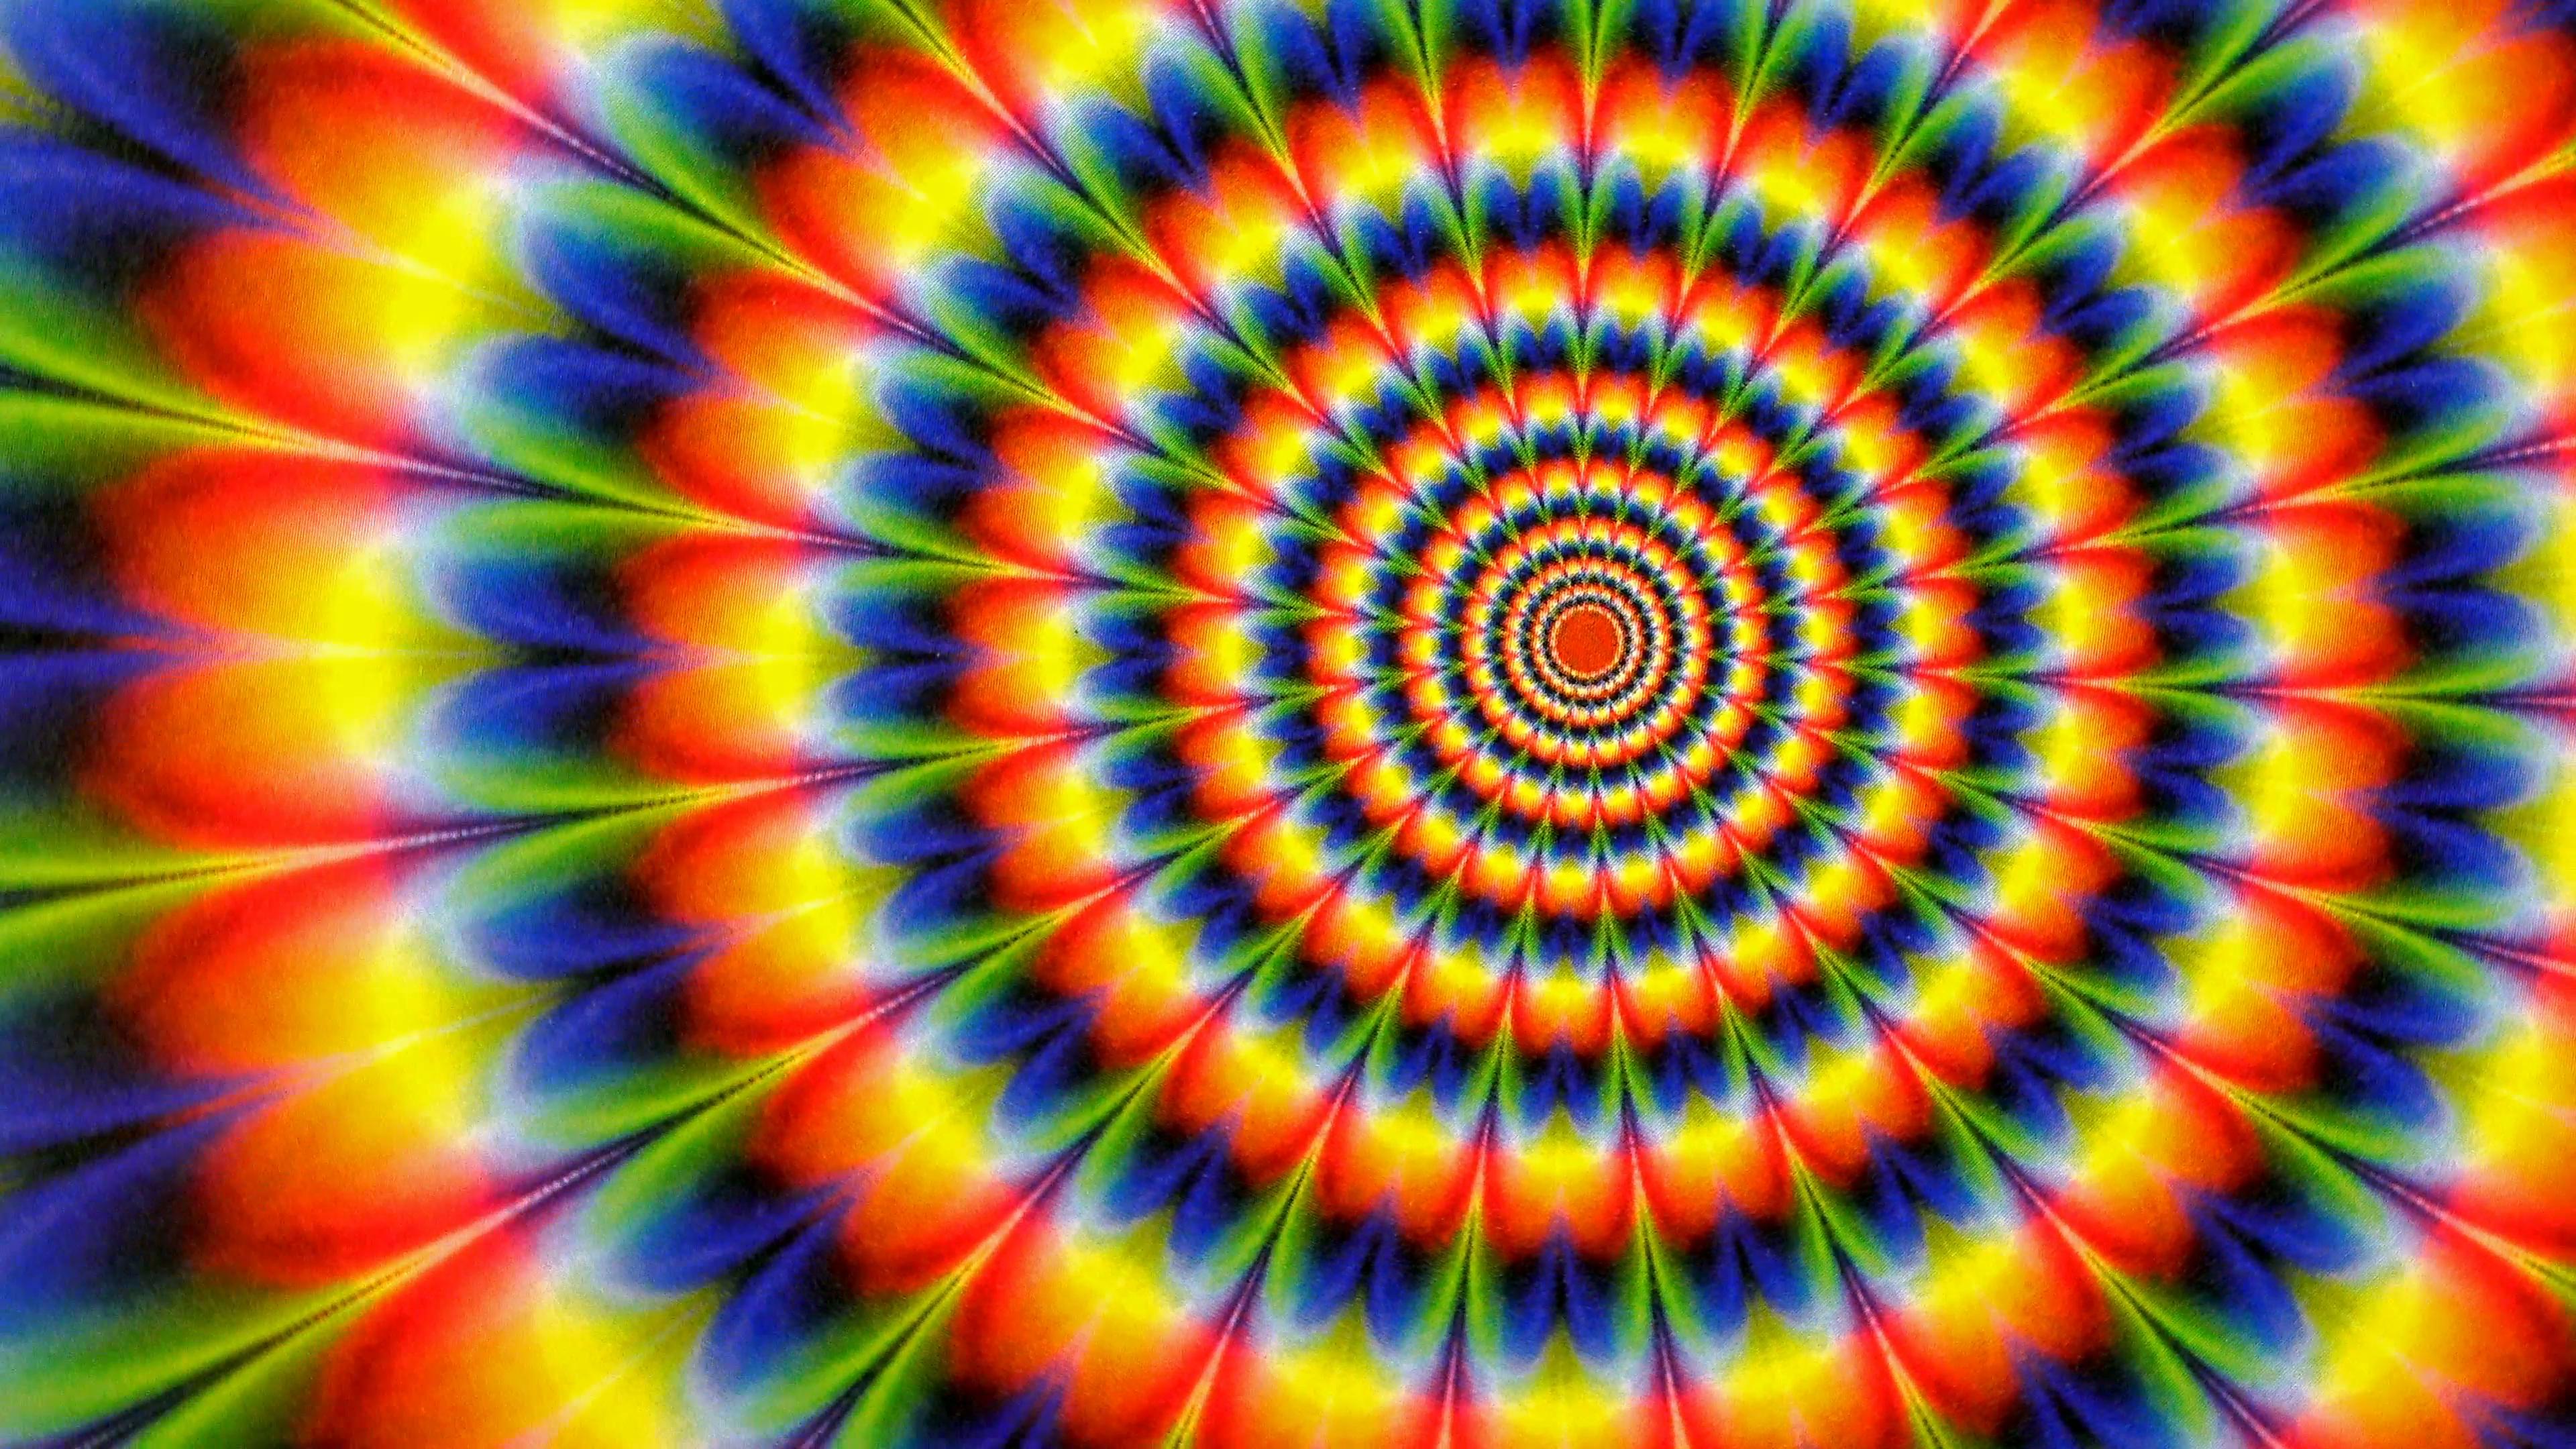 Tie Dye Png Hd Transparent Tie Dye Hd Png Images Pluspng